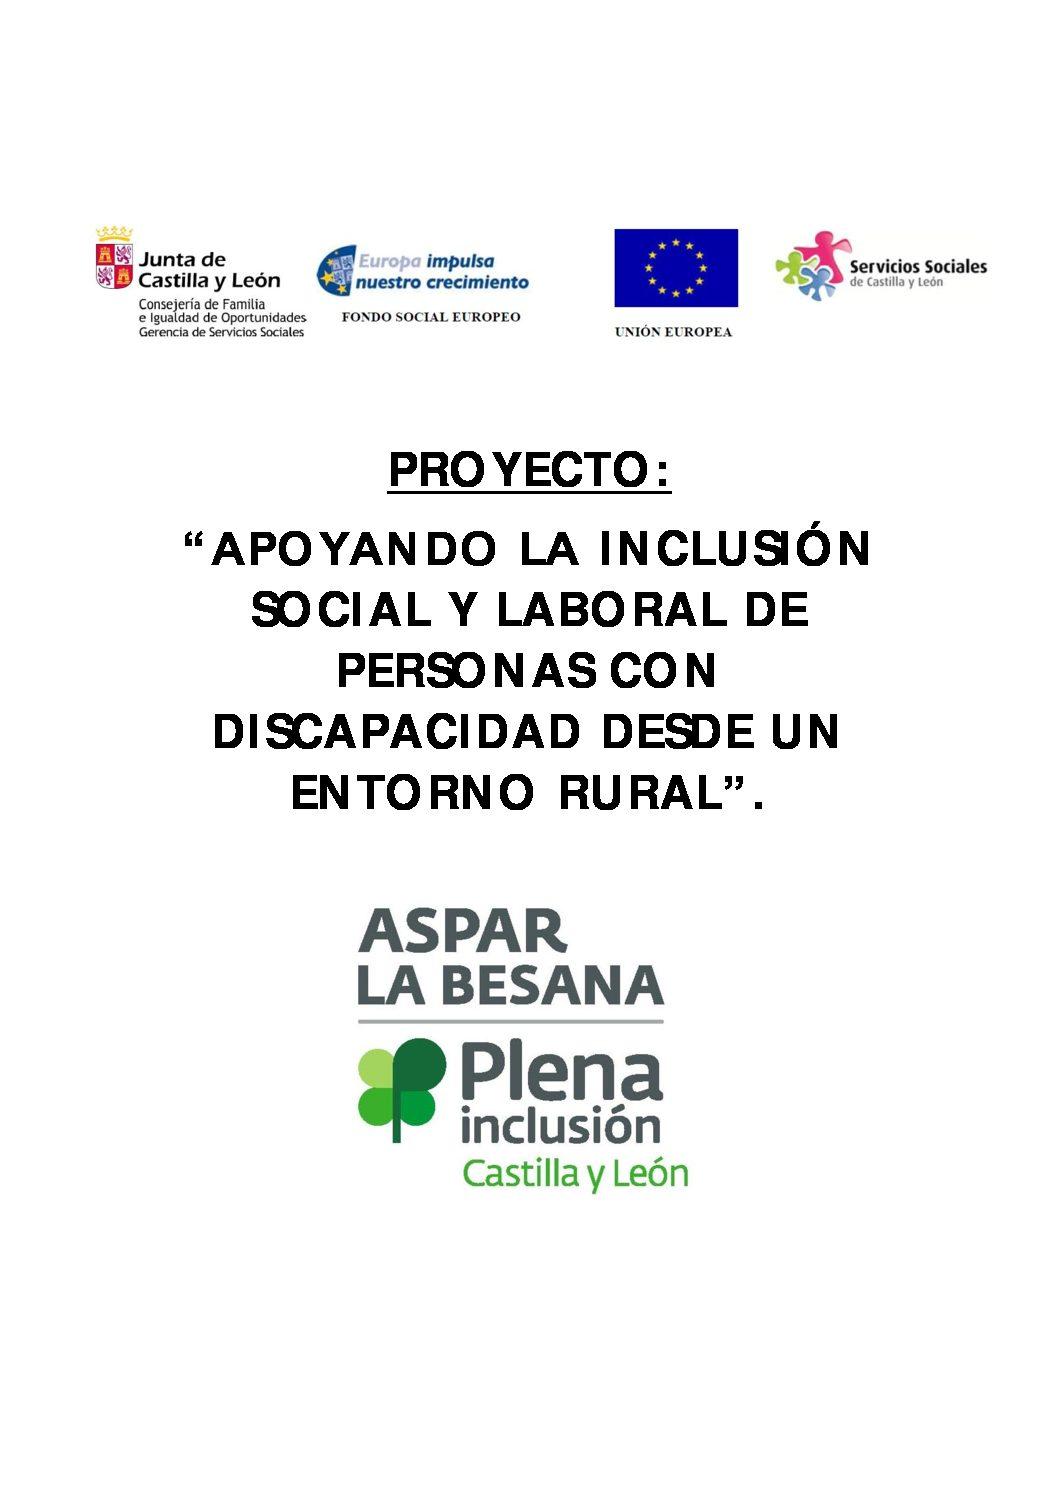 Subvención de Contratación de dos contratos para personas beneficiaras de Renta Garantizada.